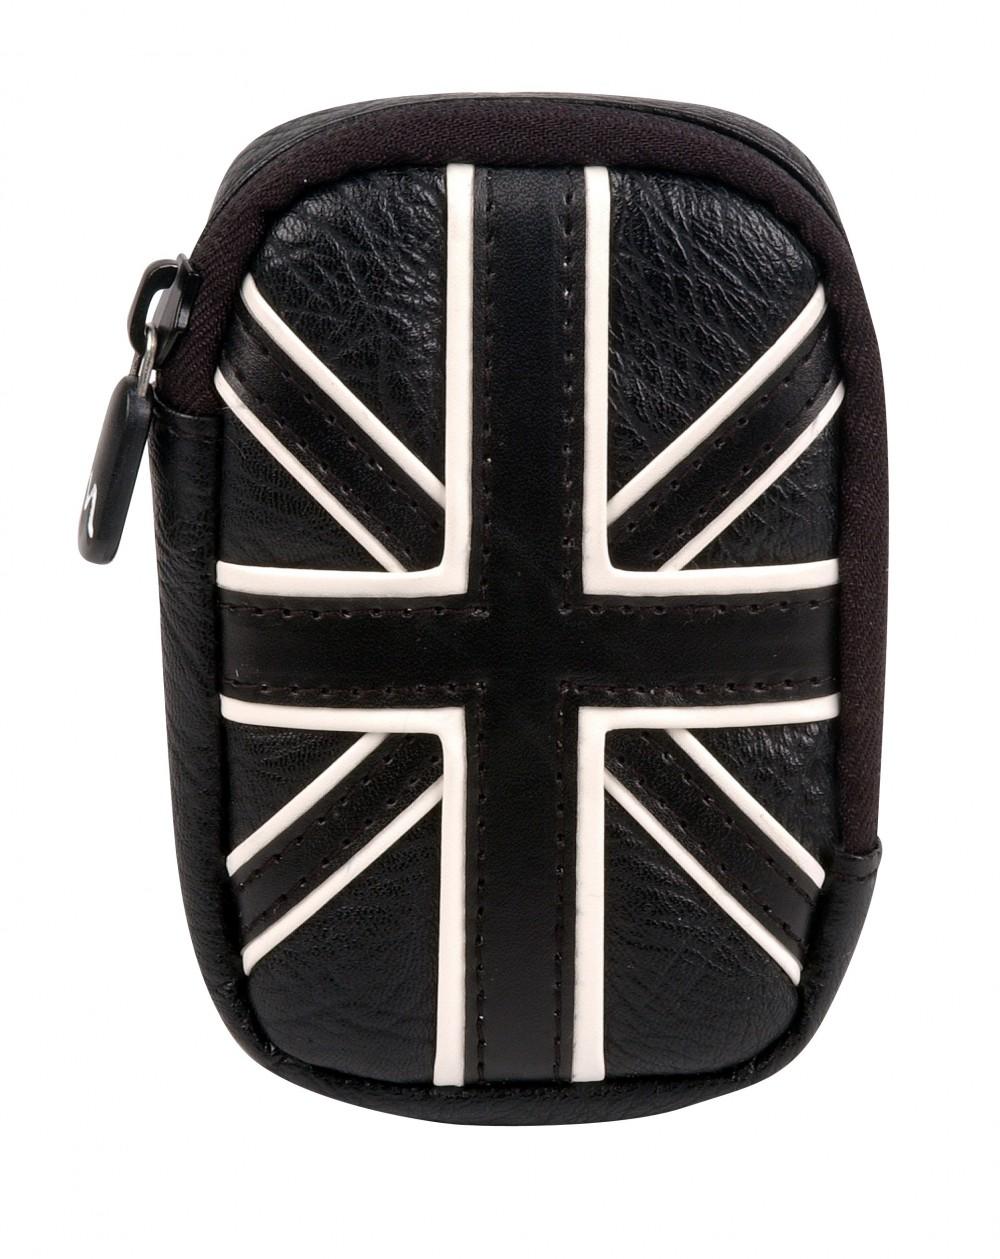 UK BLACK EDITION-ETUI APN, L